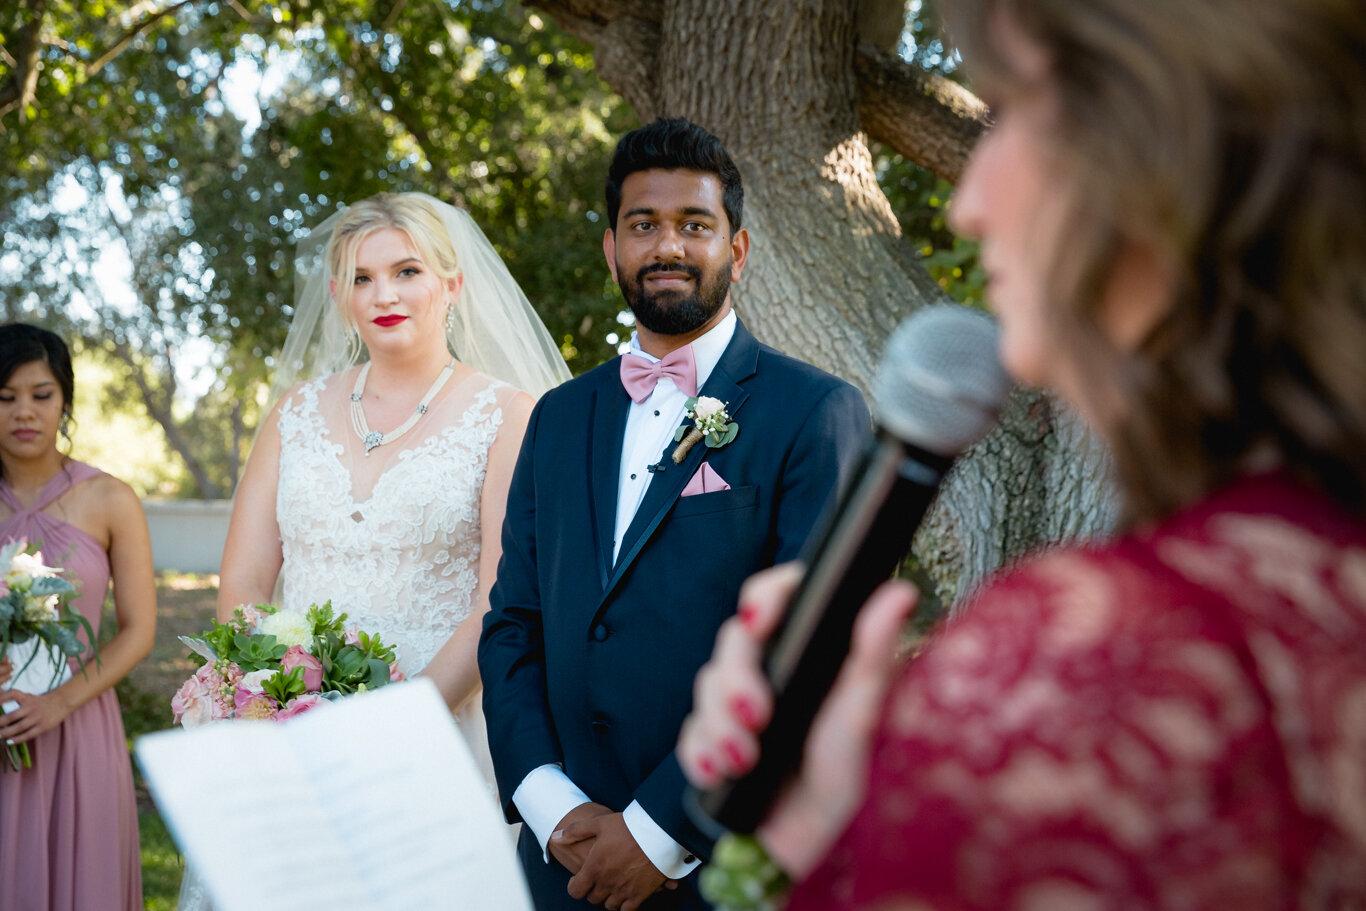 2019.08.24_Emily-Ashir-Wedding-at-the-Maples-5827.jpg